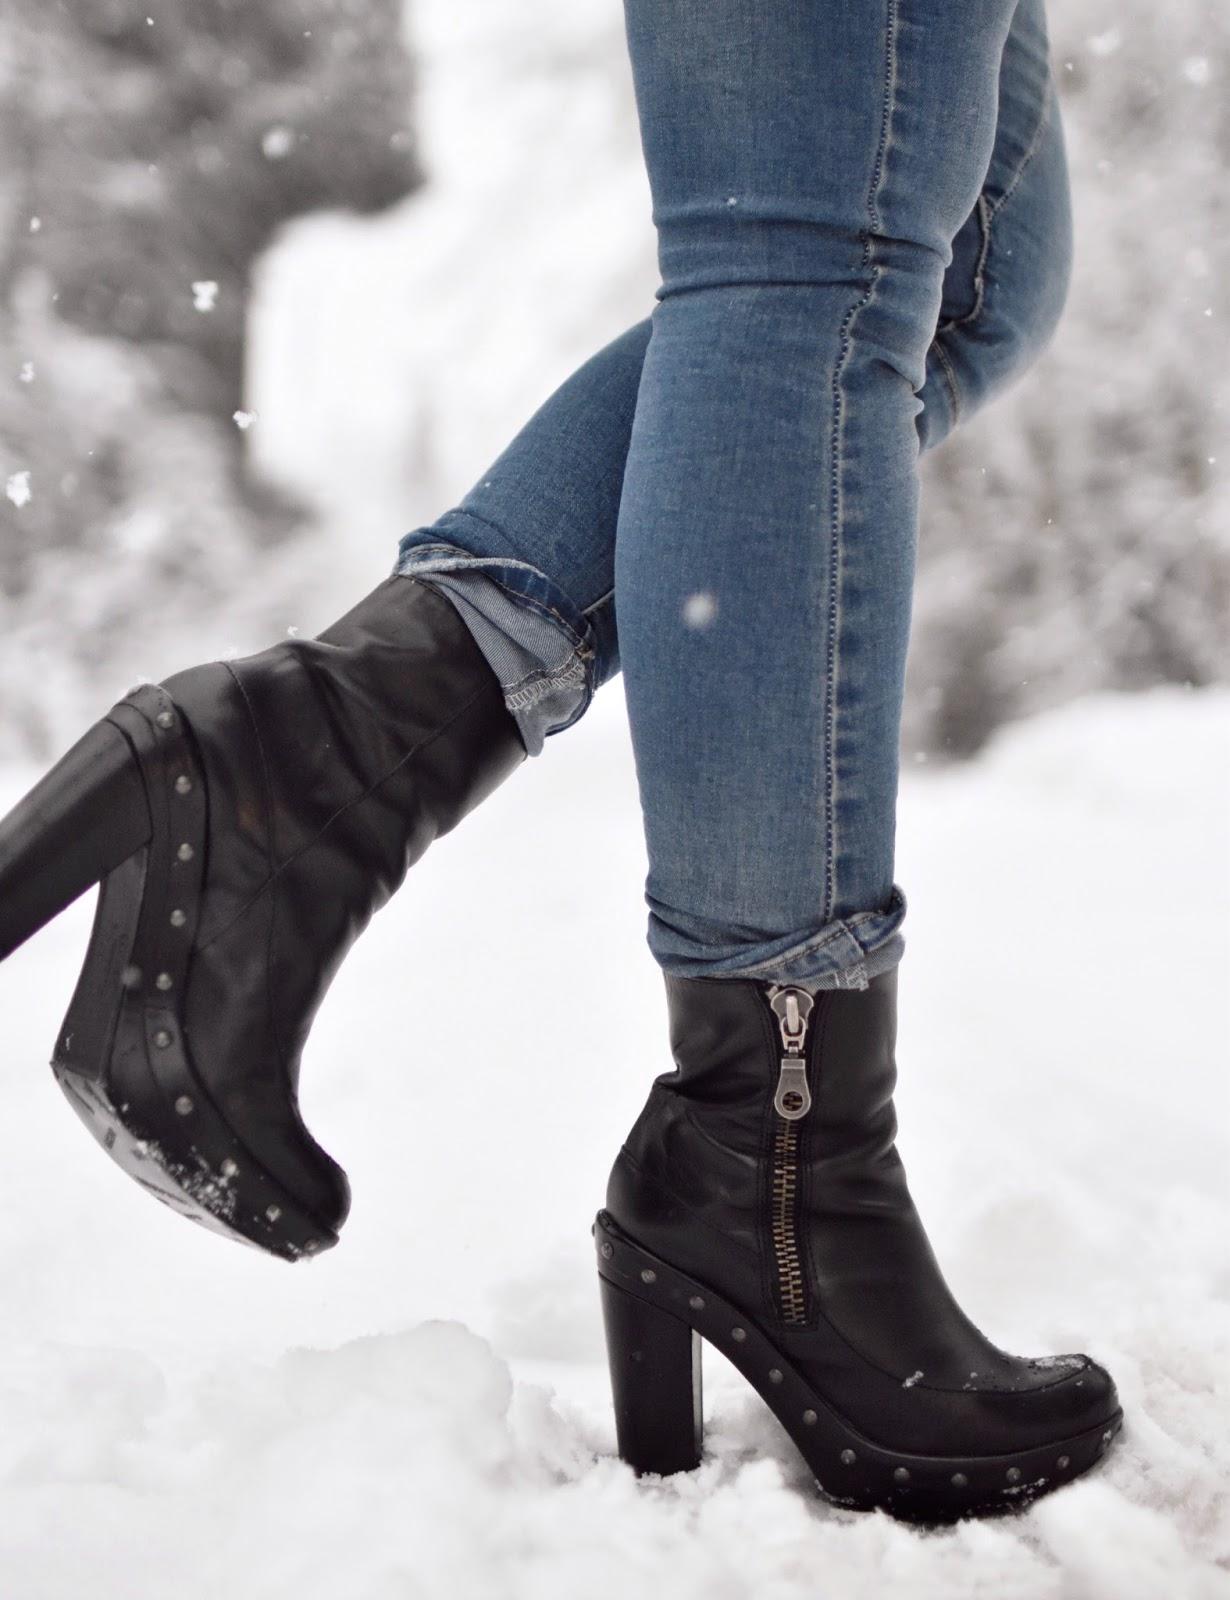 Monika Faulkner outfit inspiration - skinny jeans, Kork-Ease platform booties